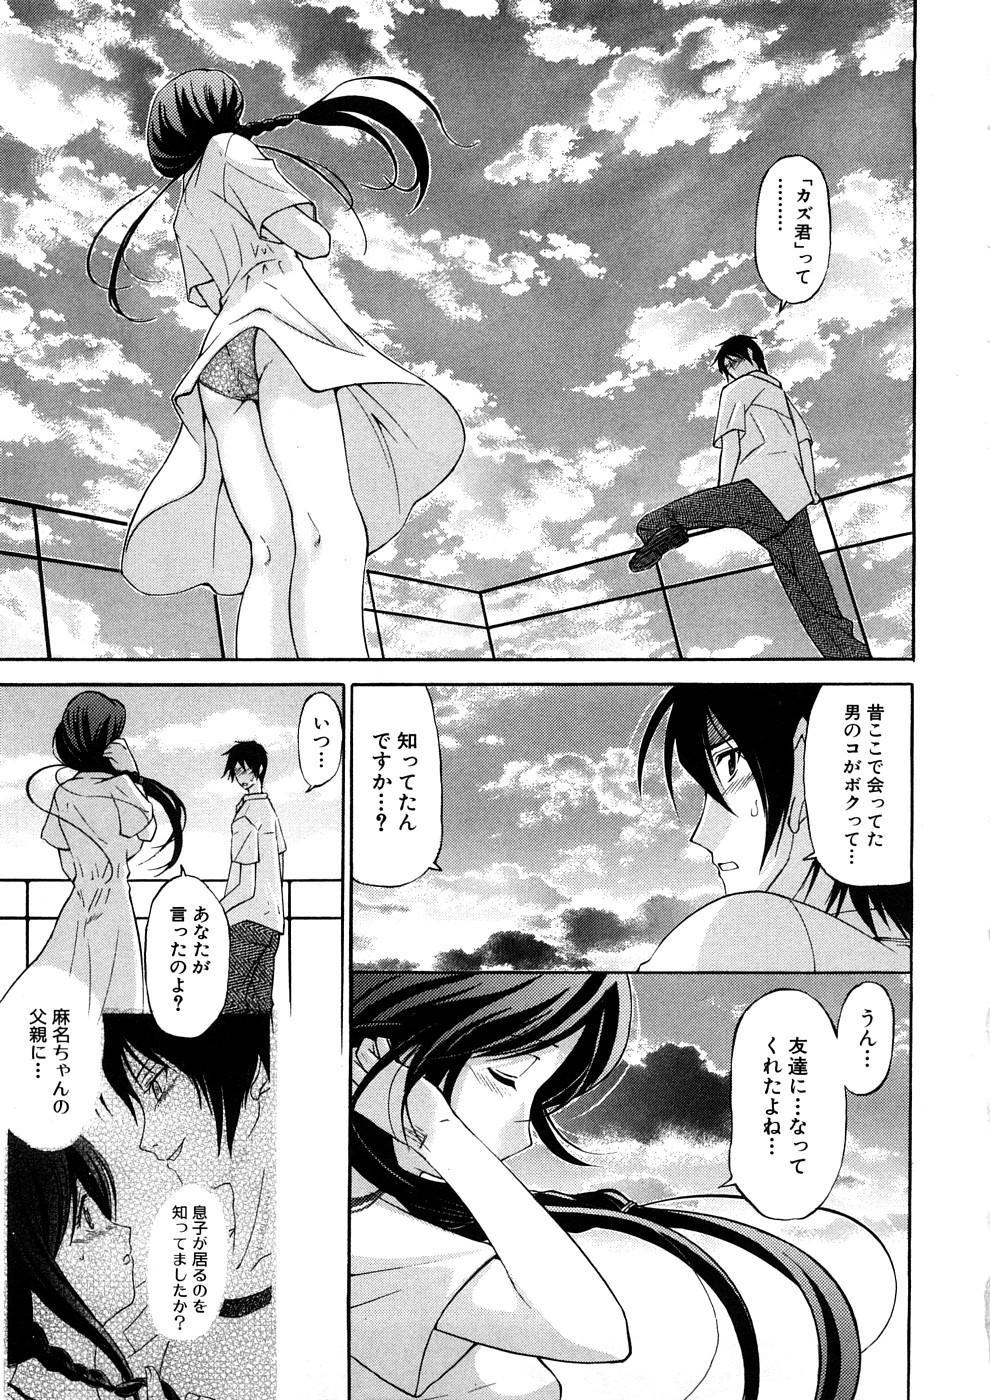 Geki Yaba Anthology Vol. 1 - Naka ni Dashite yo 7